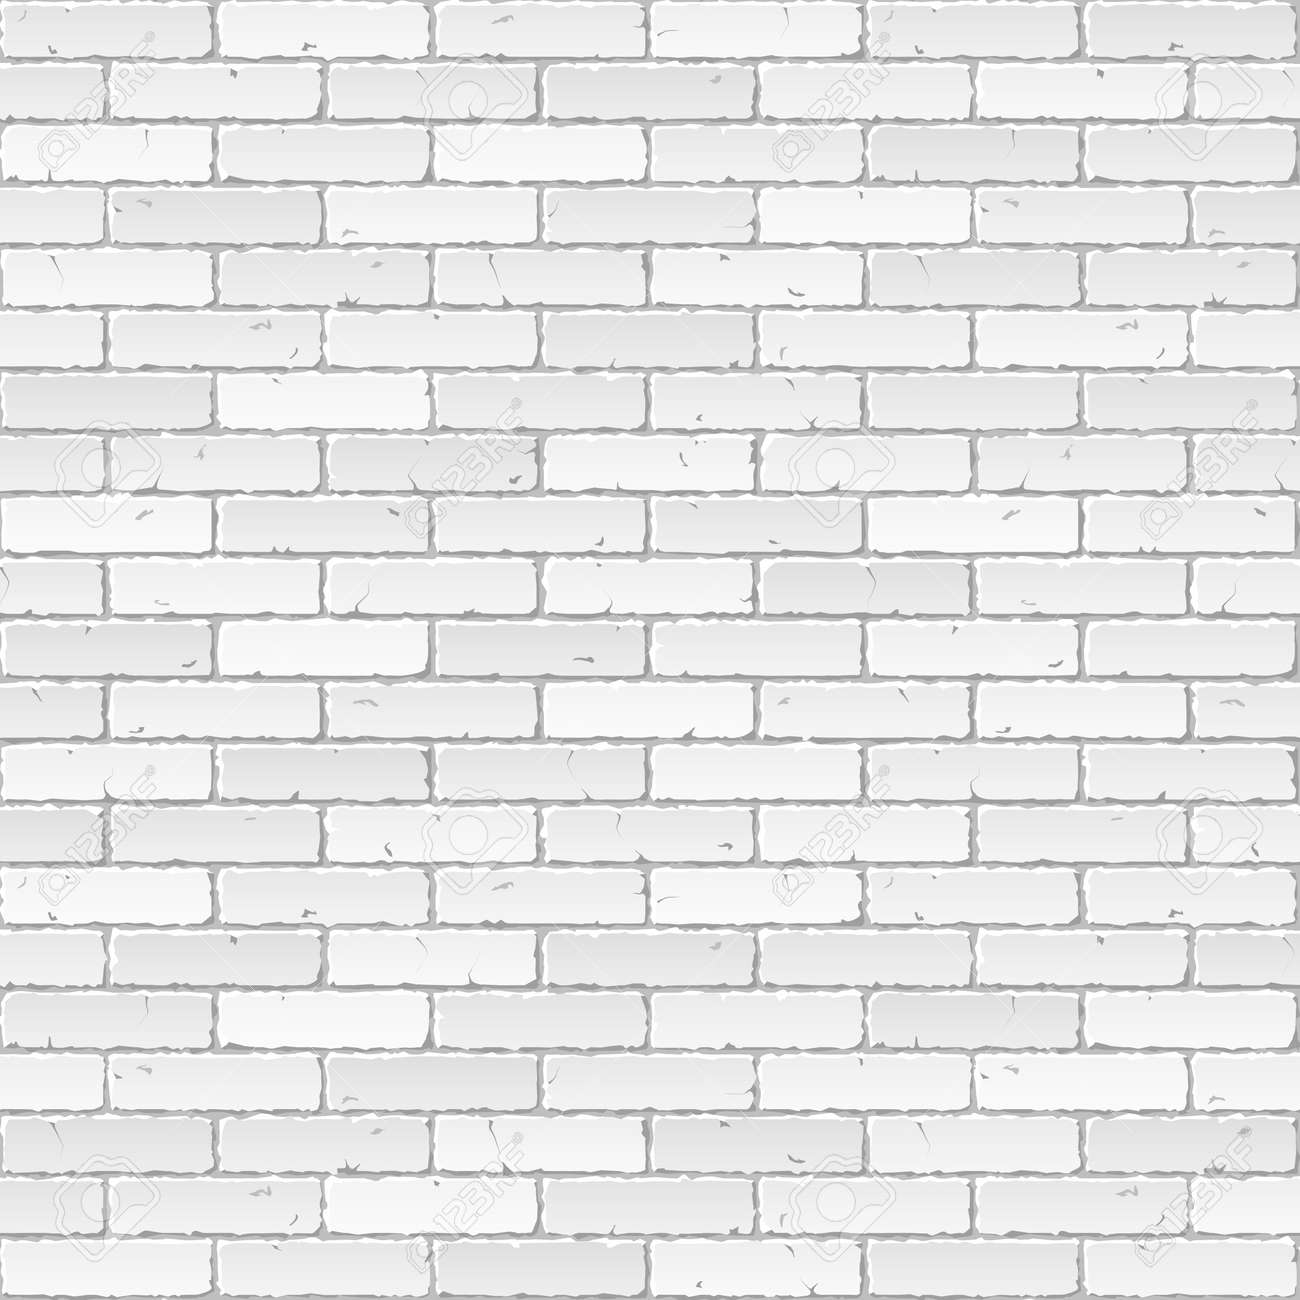 Design White Brick white brick wall royalty free cliparts vectors and stock vector 11870793